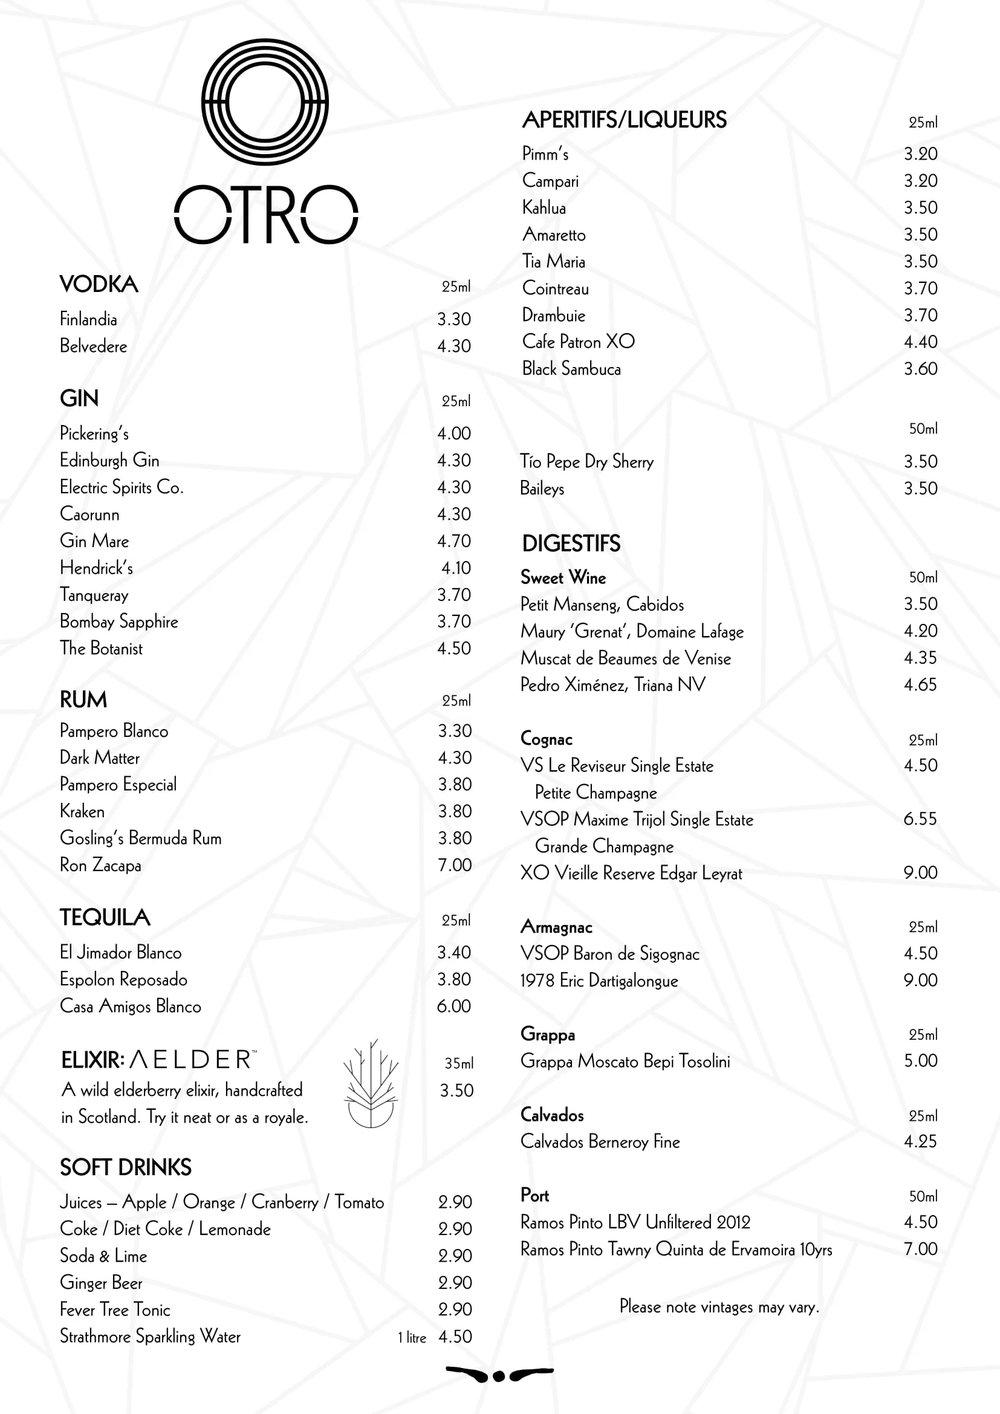 otro drinks list 3.jpg